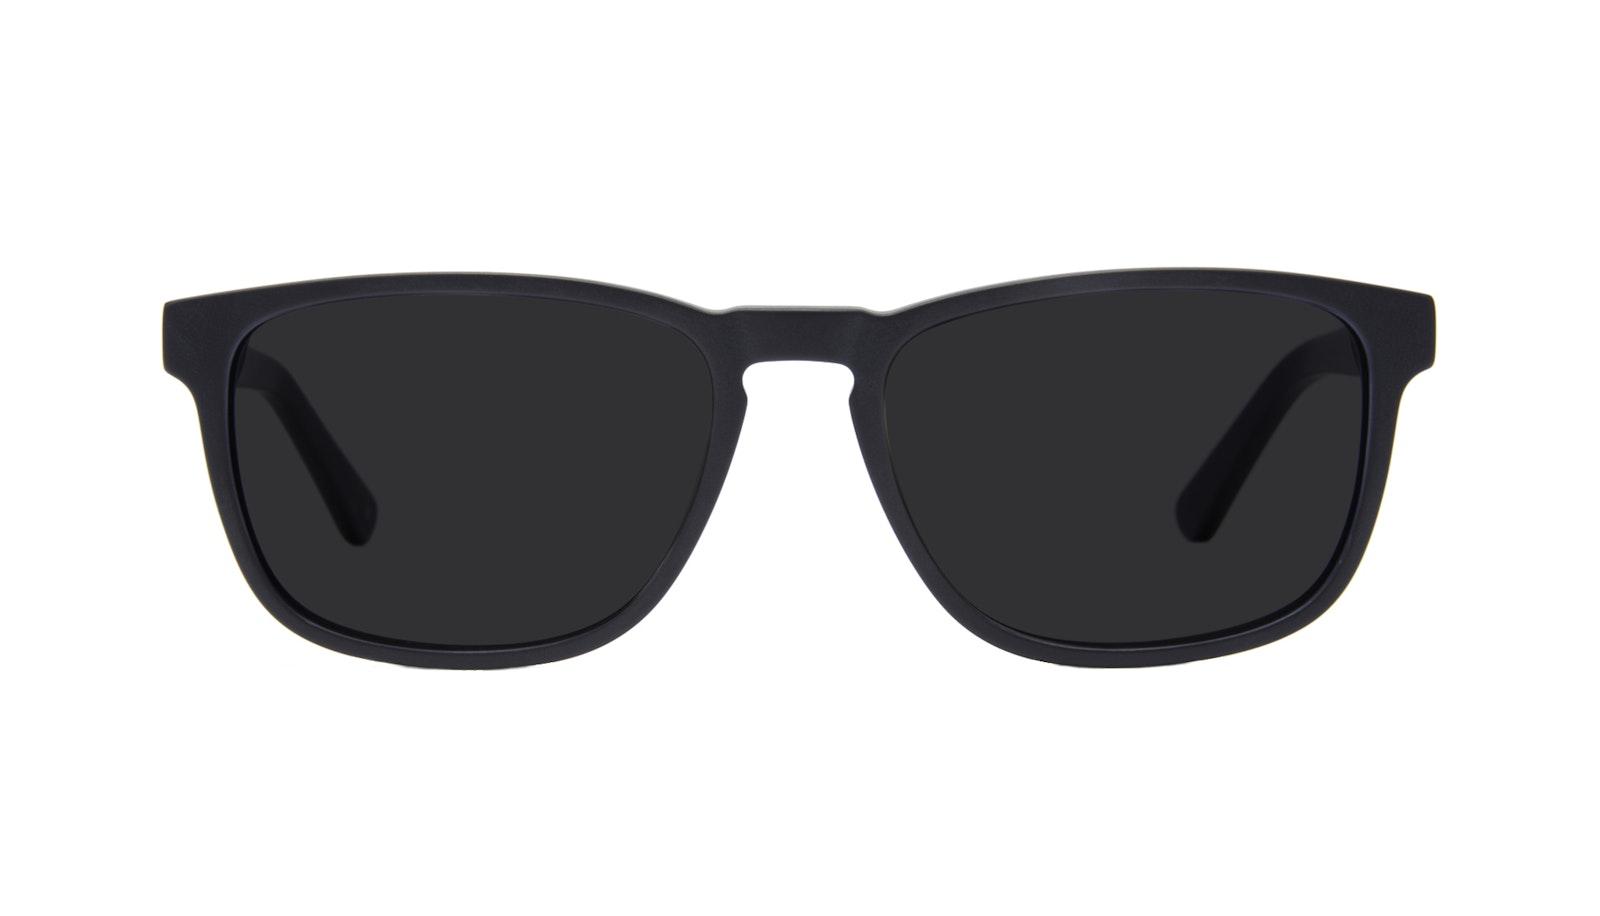 Affordable Fashion Glasses Rectangle Sunglasses Men Loft Black Matte